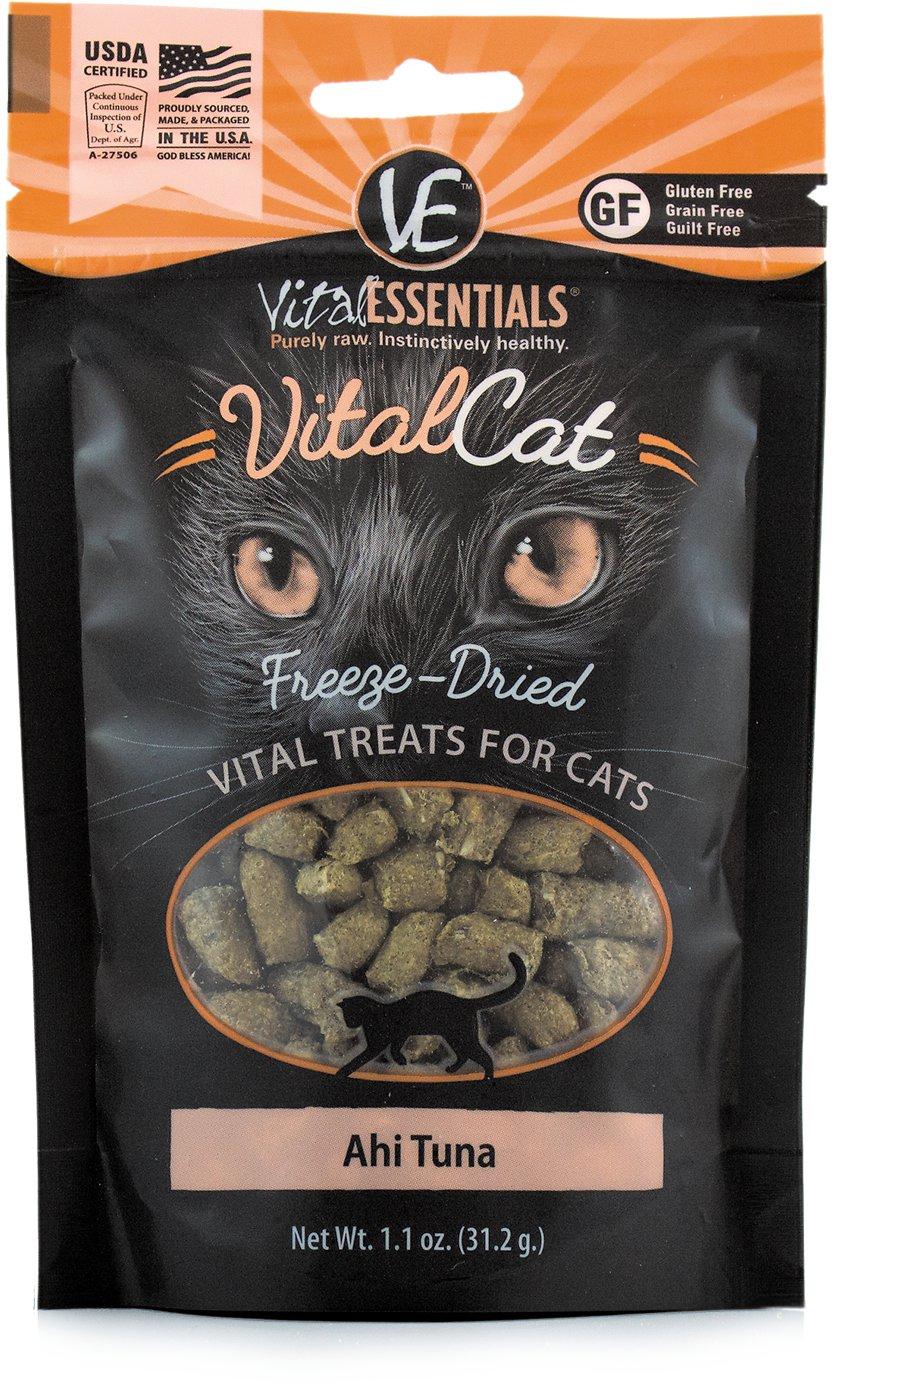 Vital Essentials Vital Cat Treats Ahi Tuna Freeze-Dried Cat Treats, 1.1-oz bag